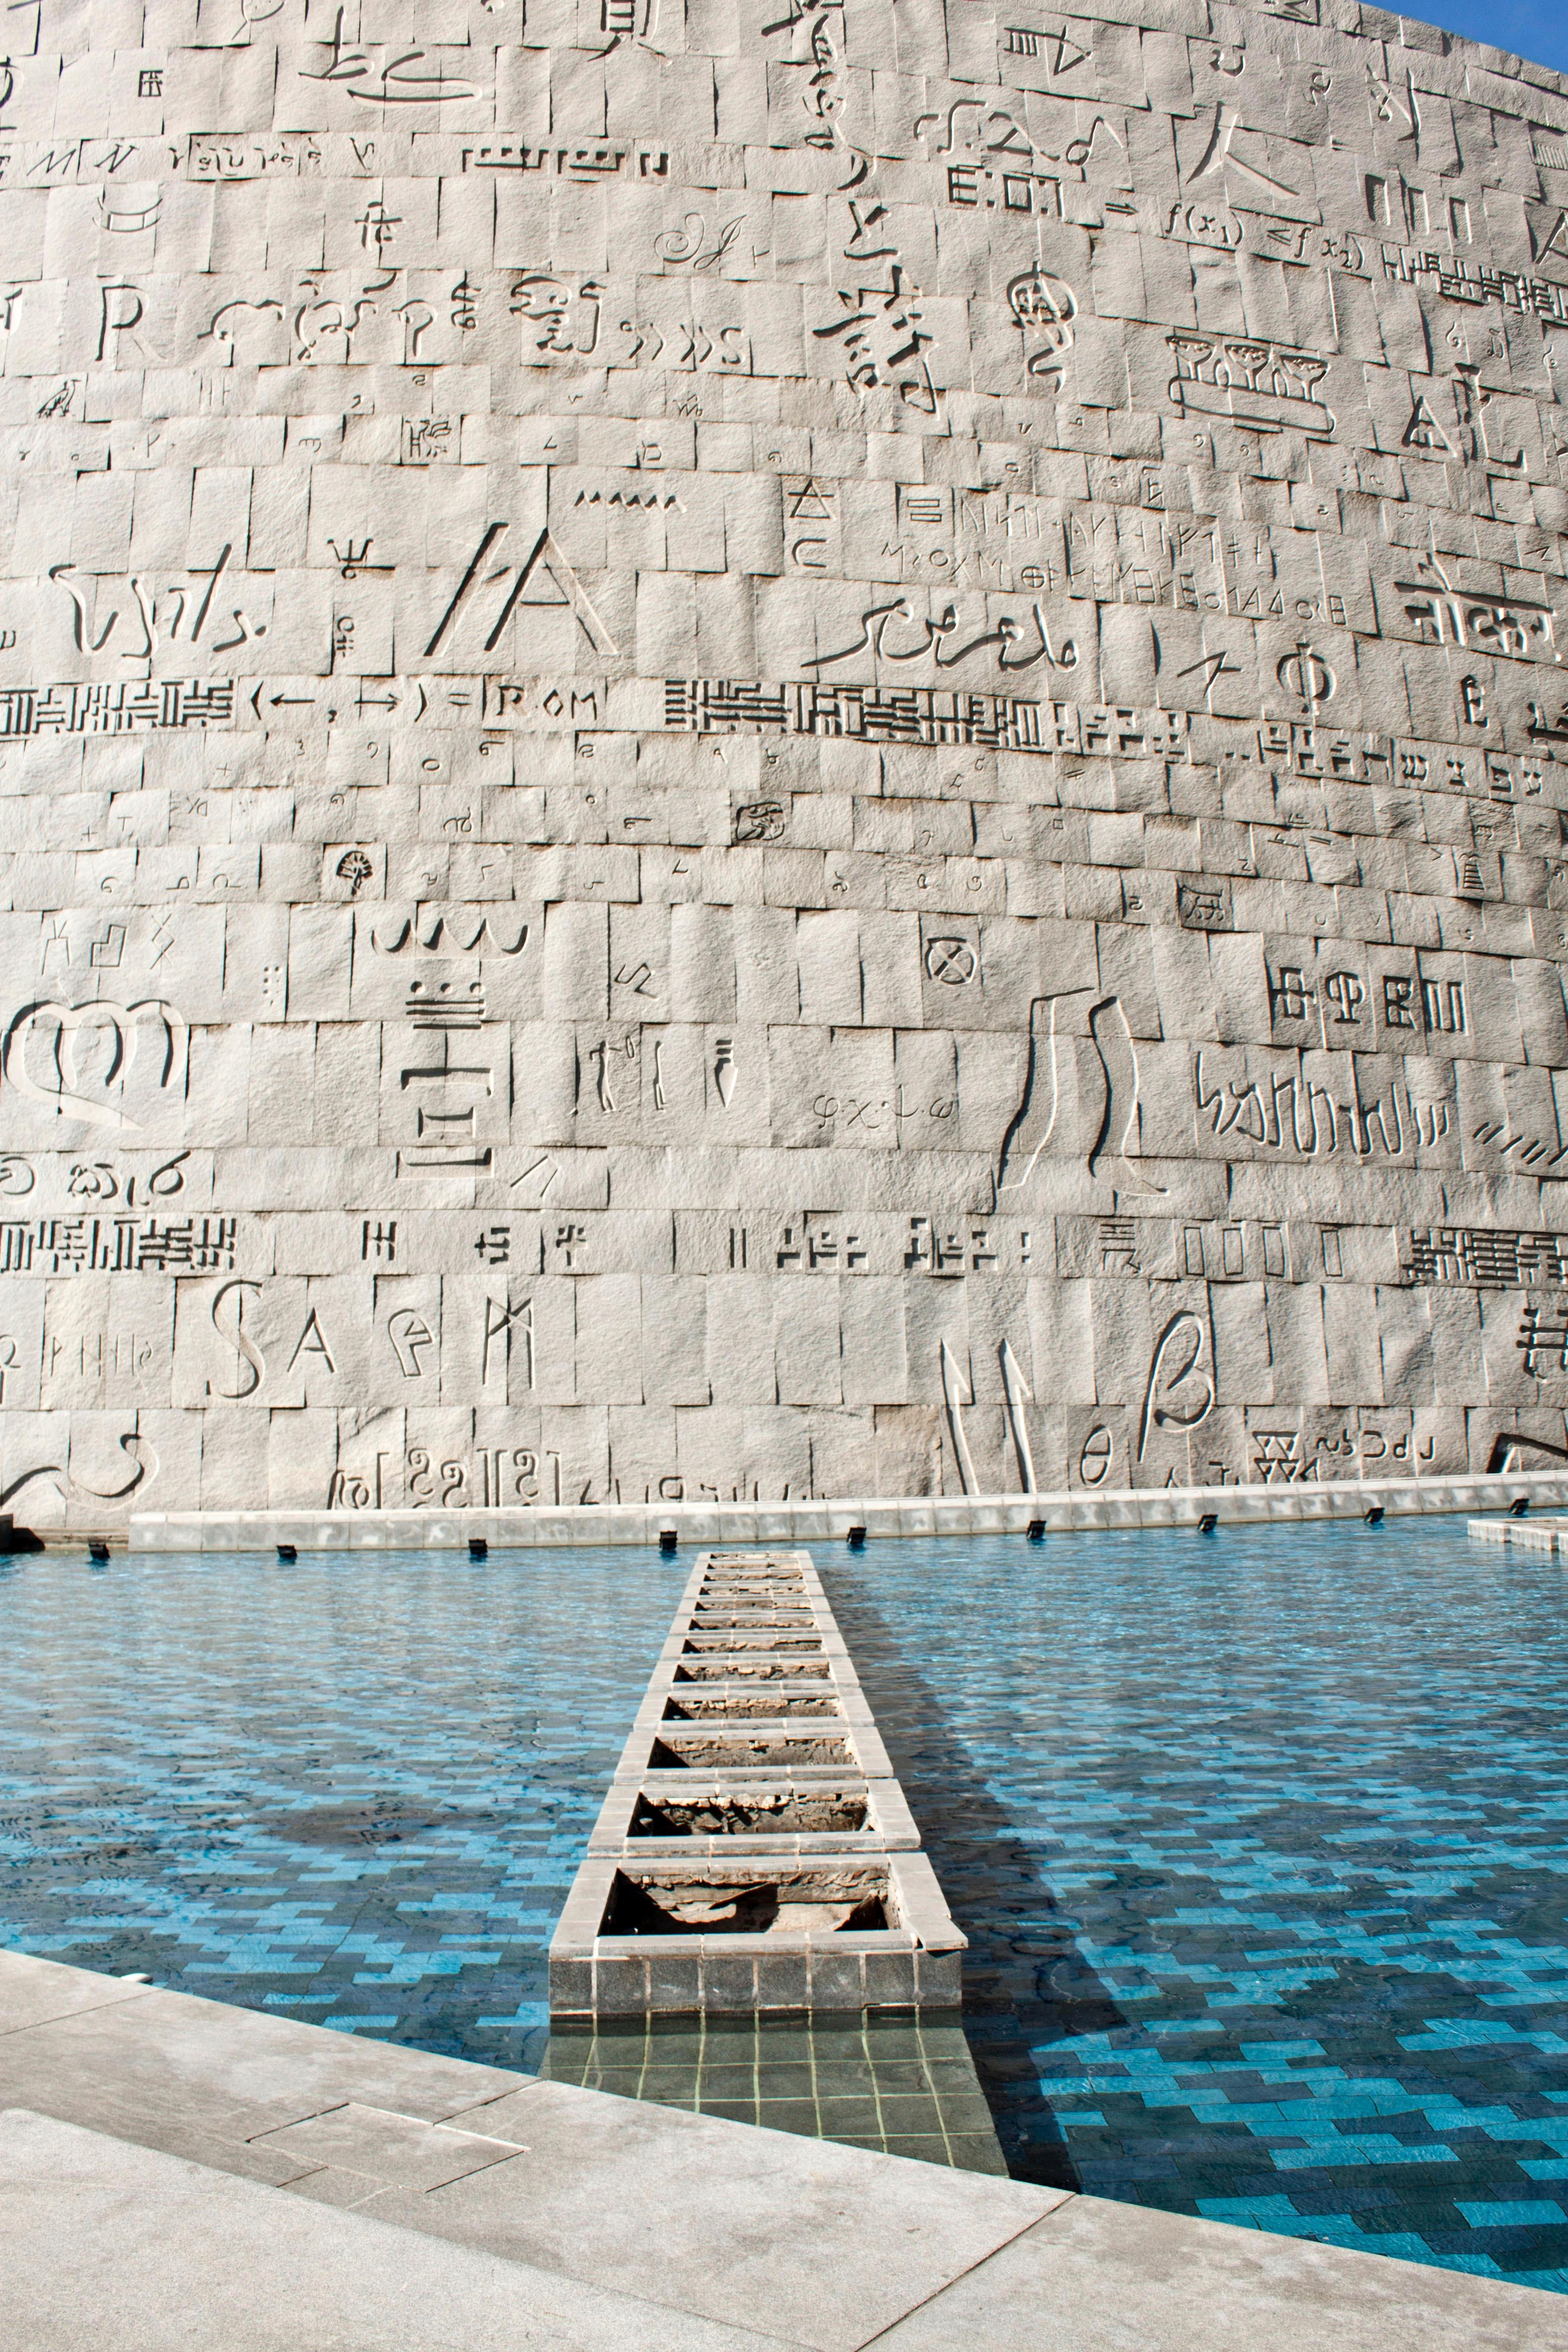 Swimming Pool Near Concrete Wall, Ancient, Architecture, Building, Concrete, HQ Photo